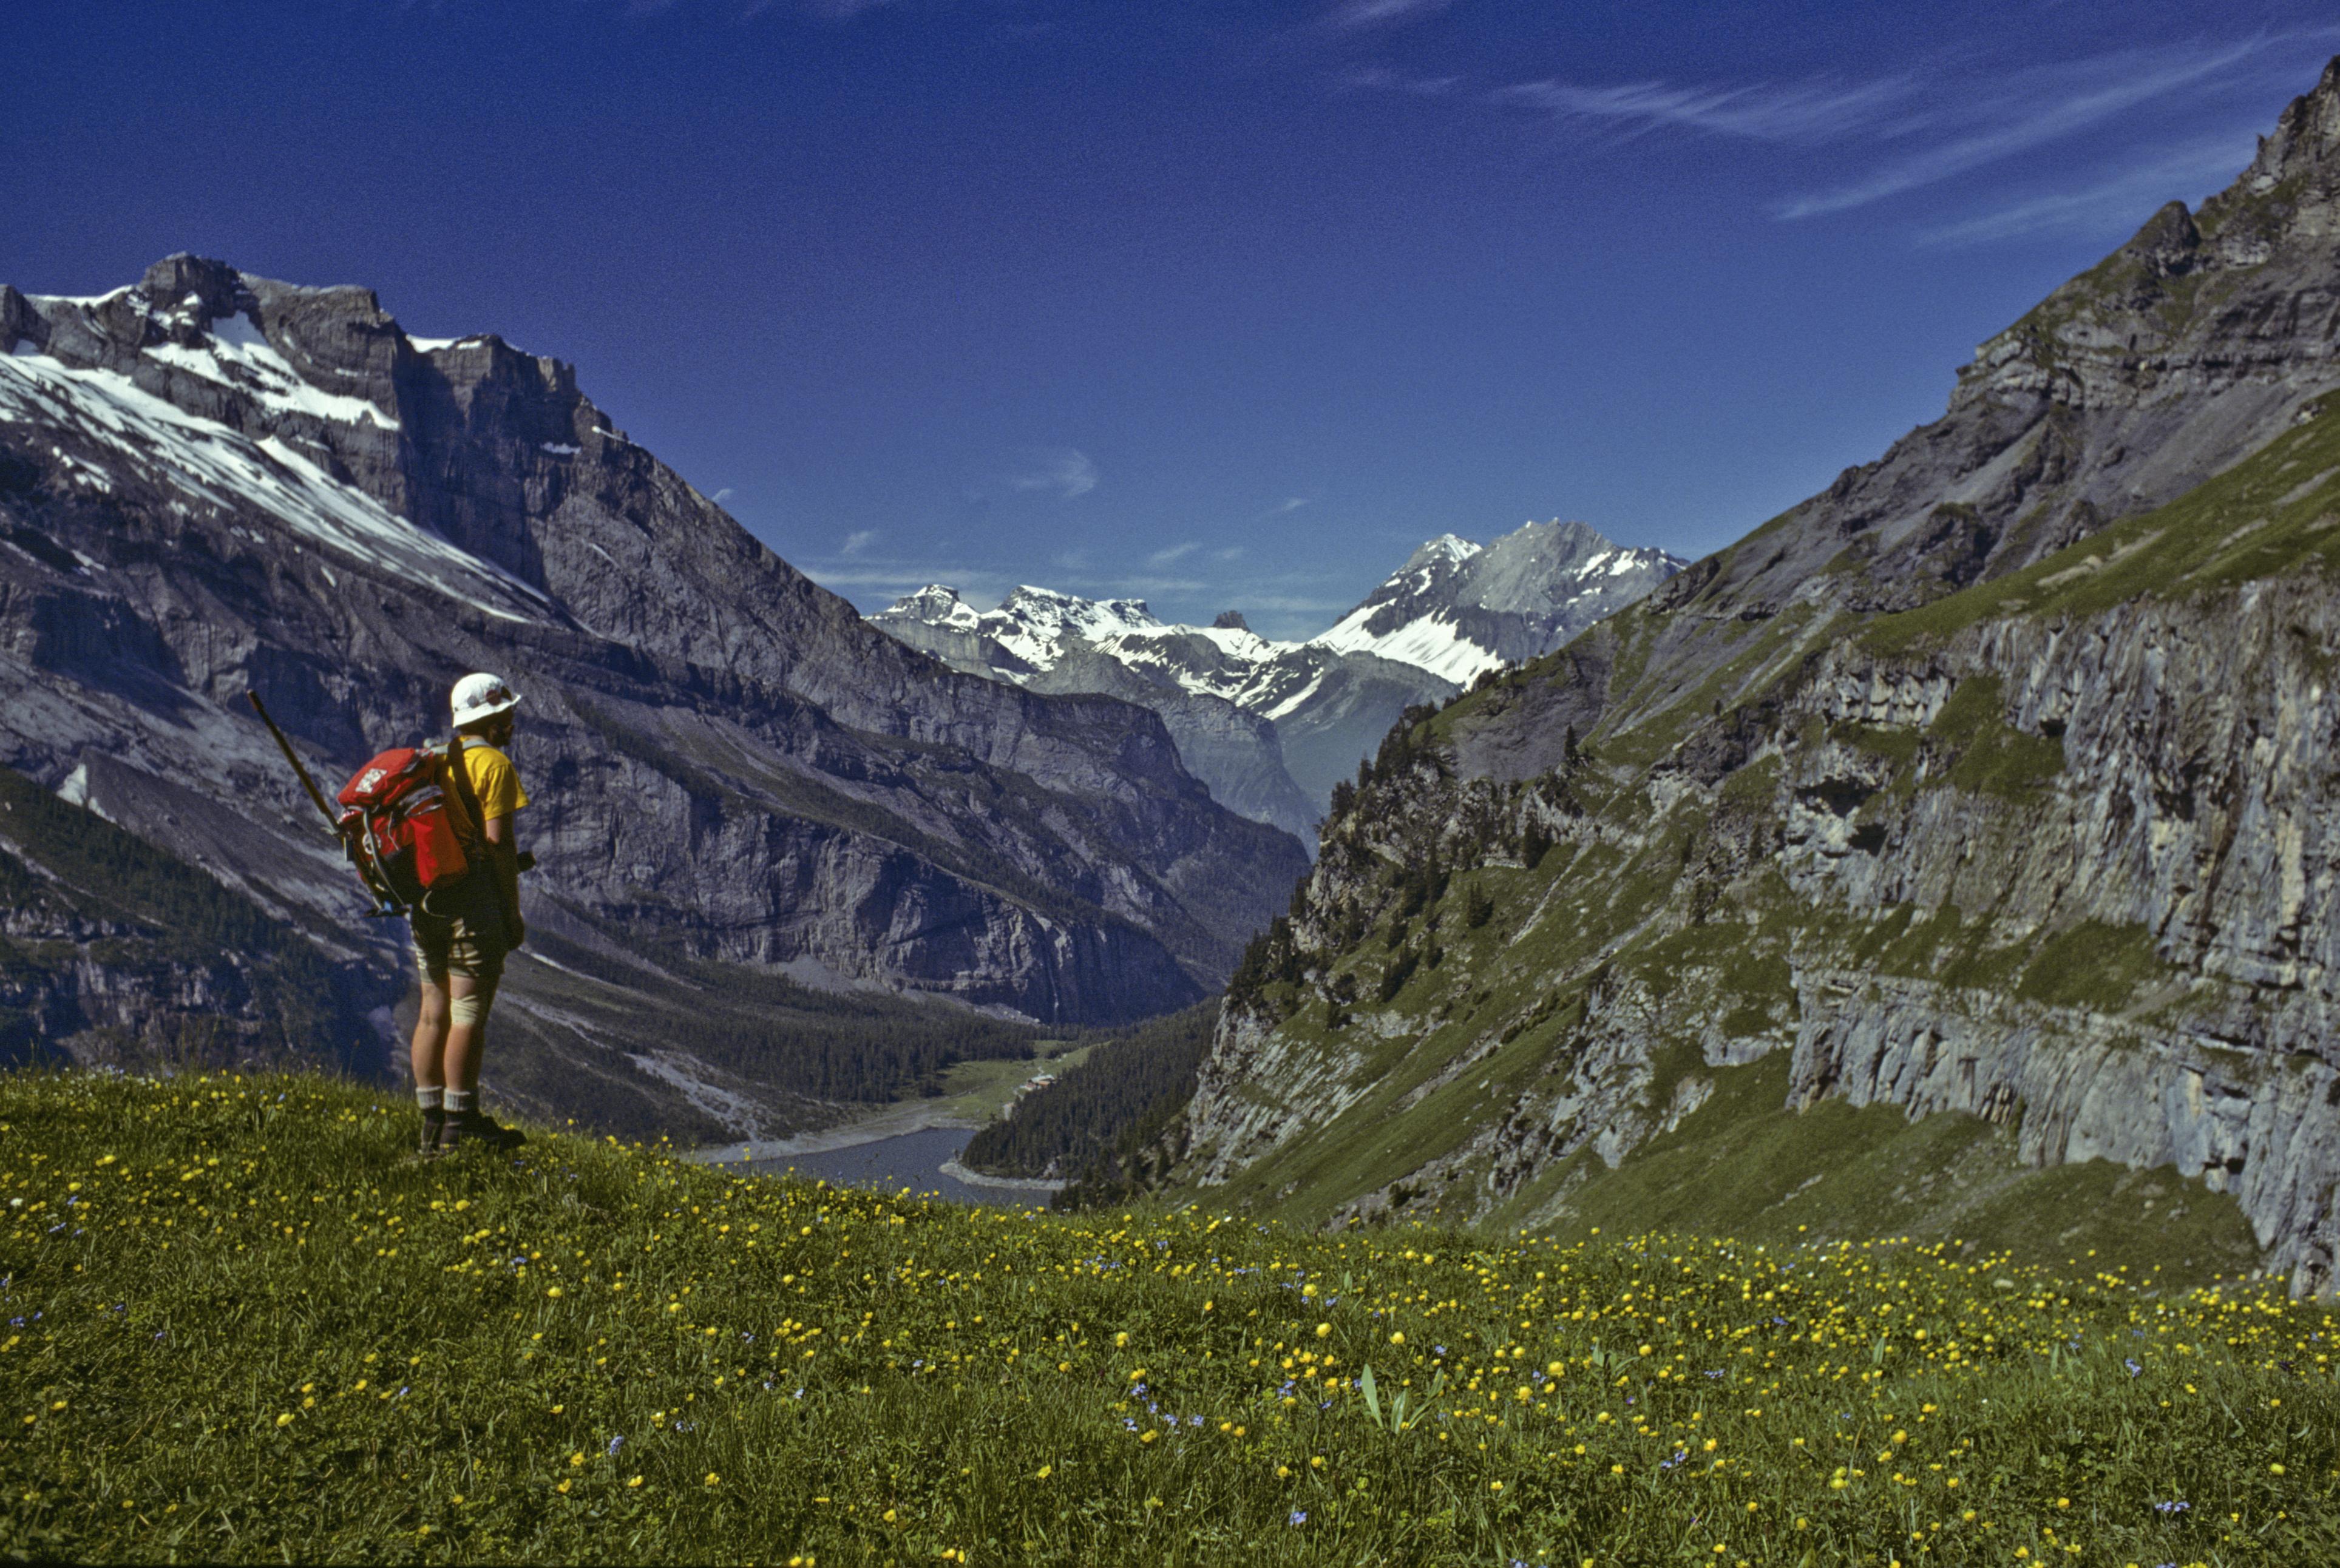 Enjoying hiking in the Swiss Alps